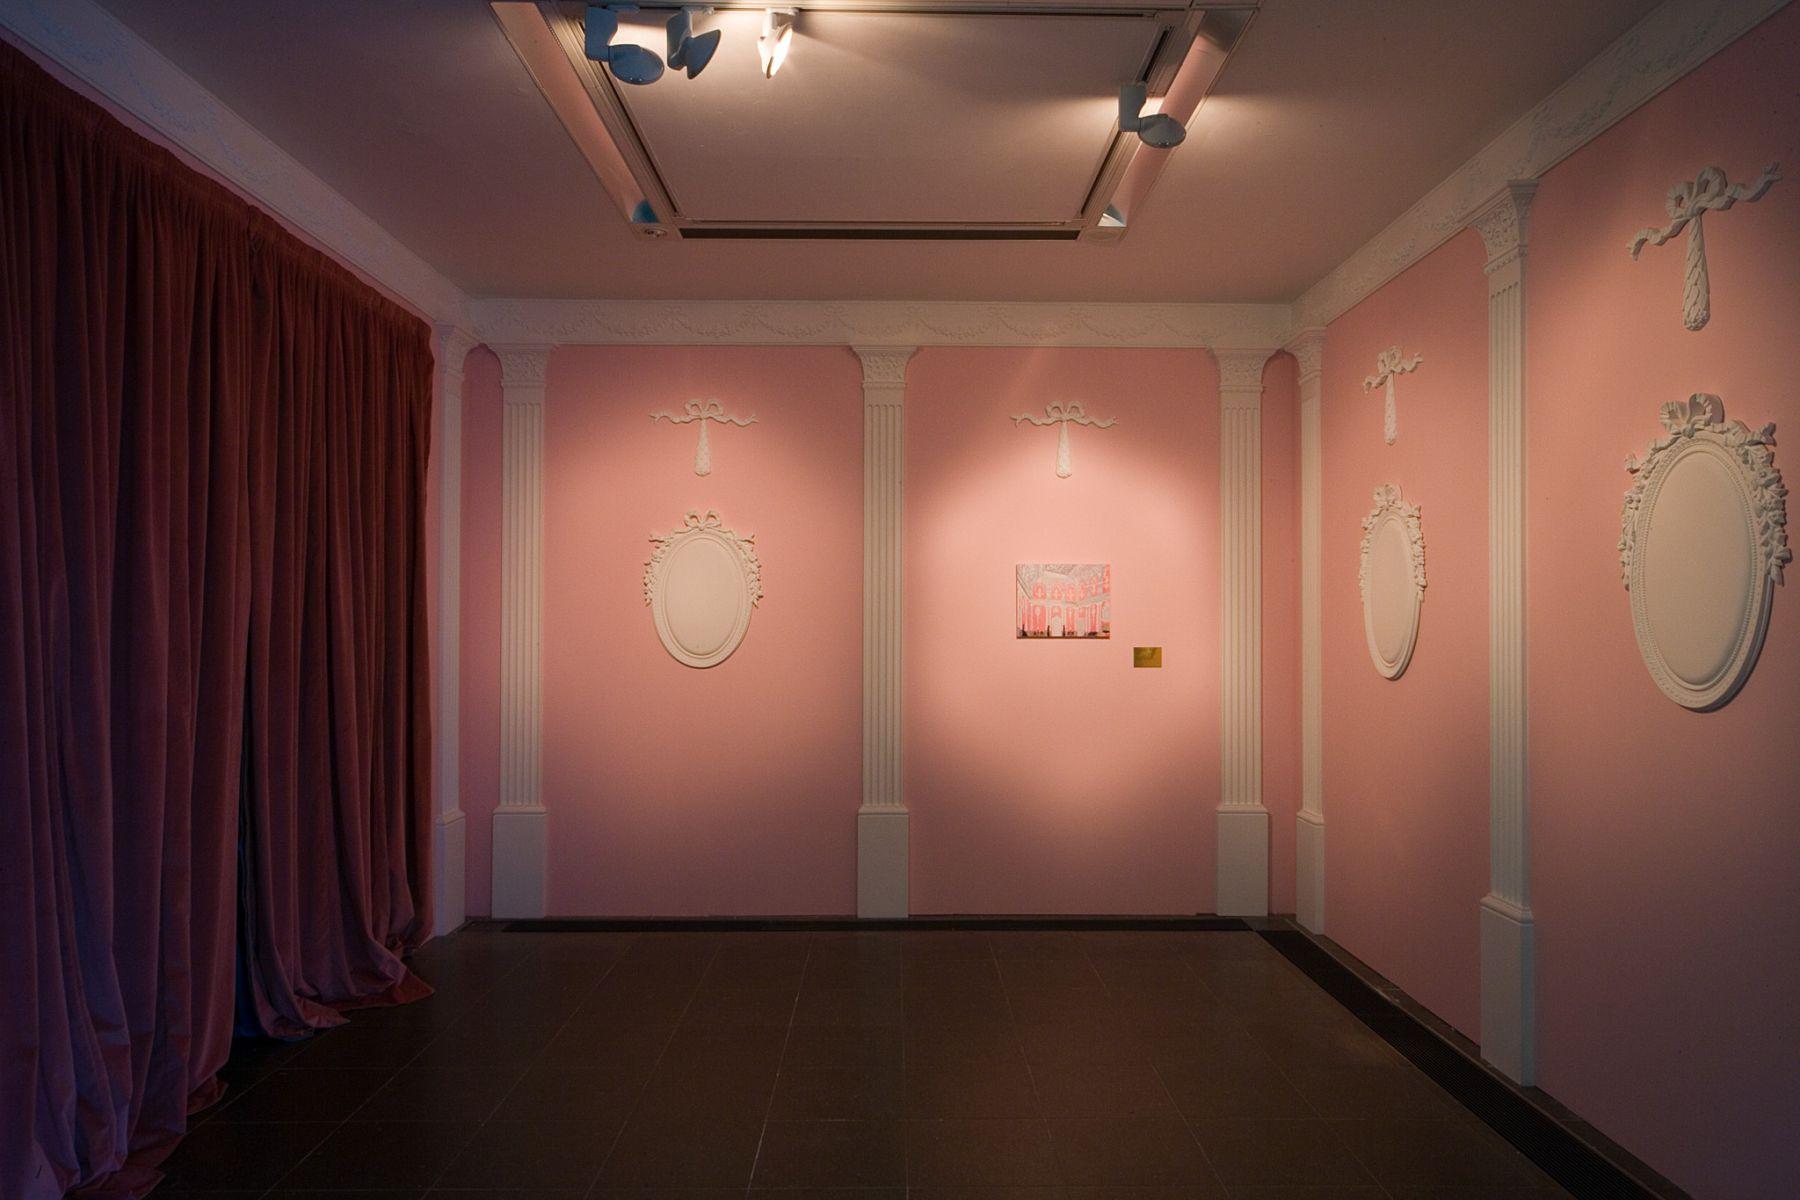 Karen Kilimnik, Serpentine Galleries, London, 2007